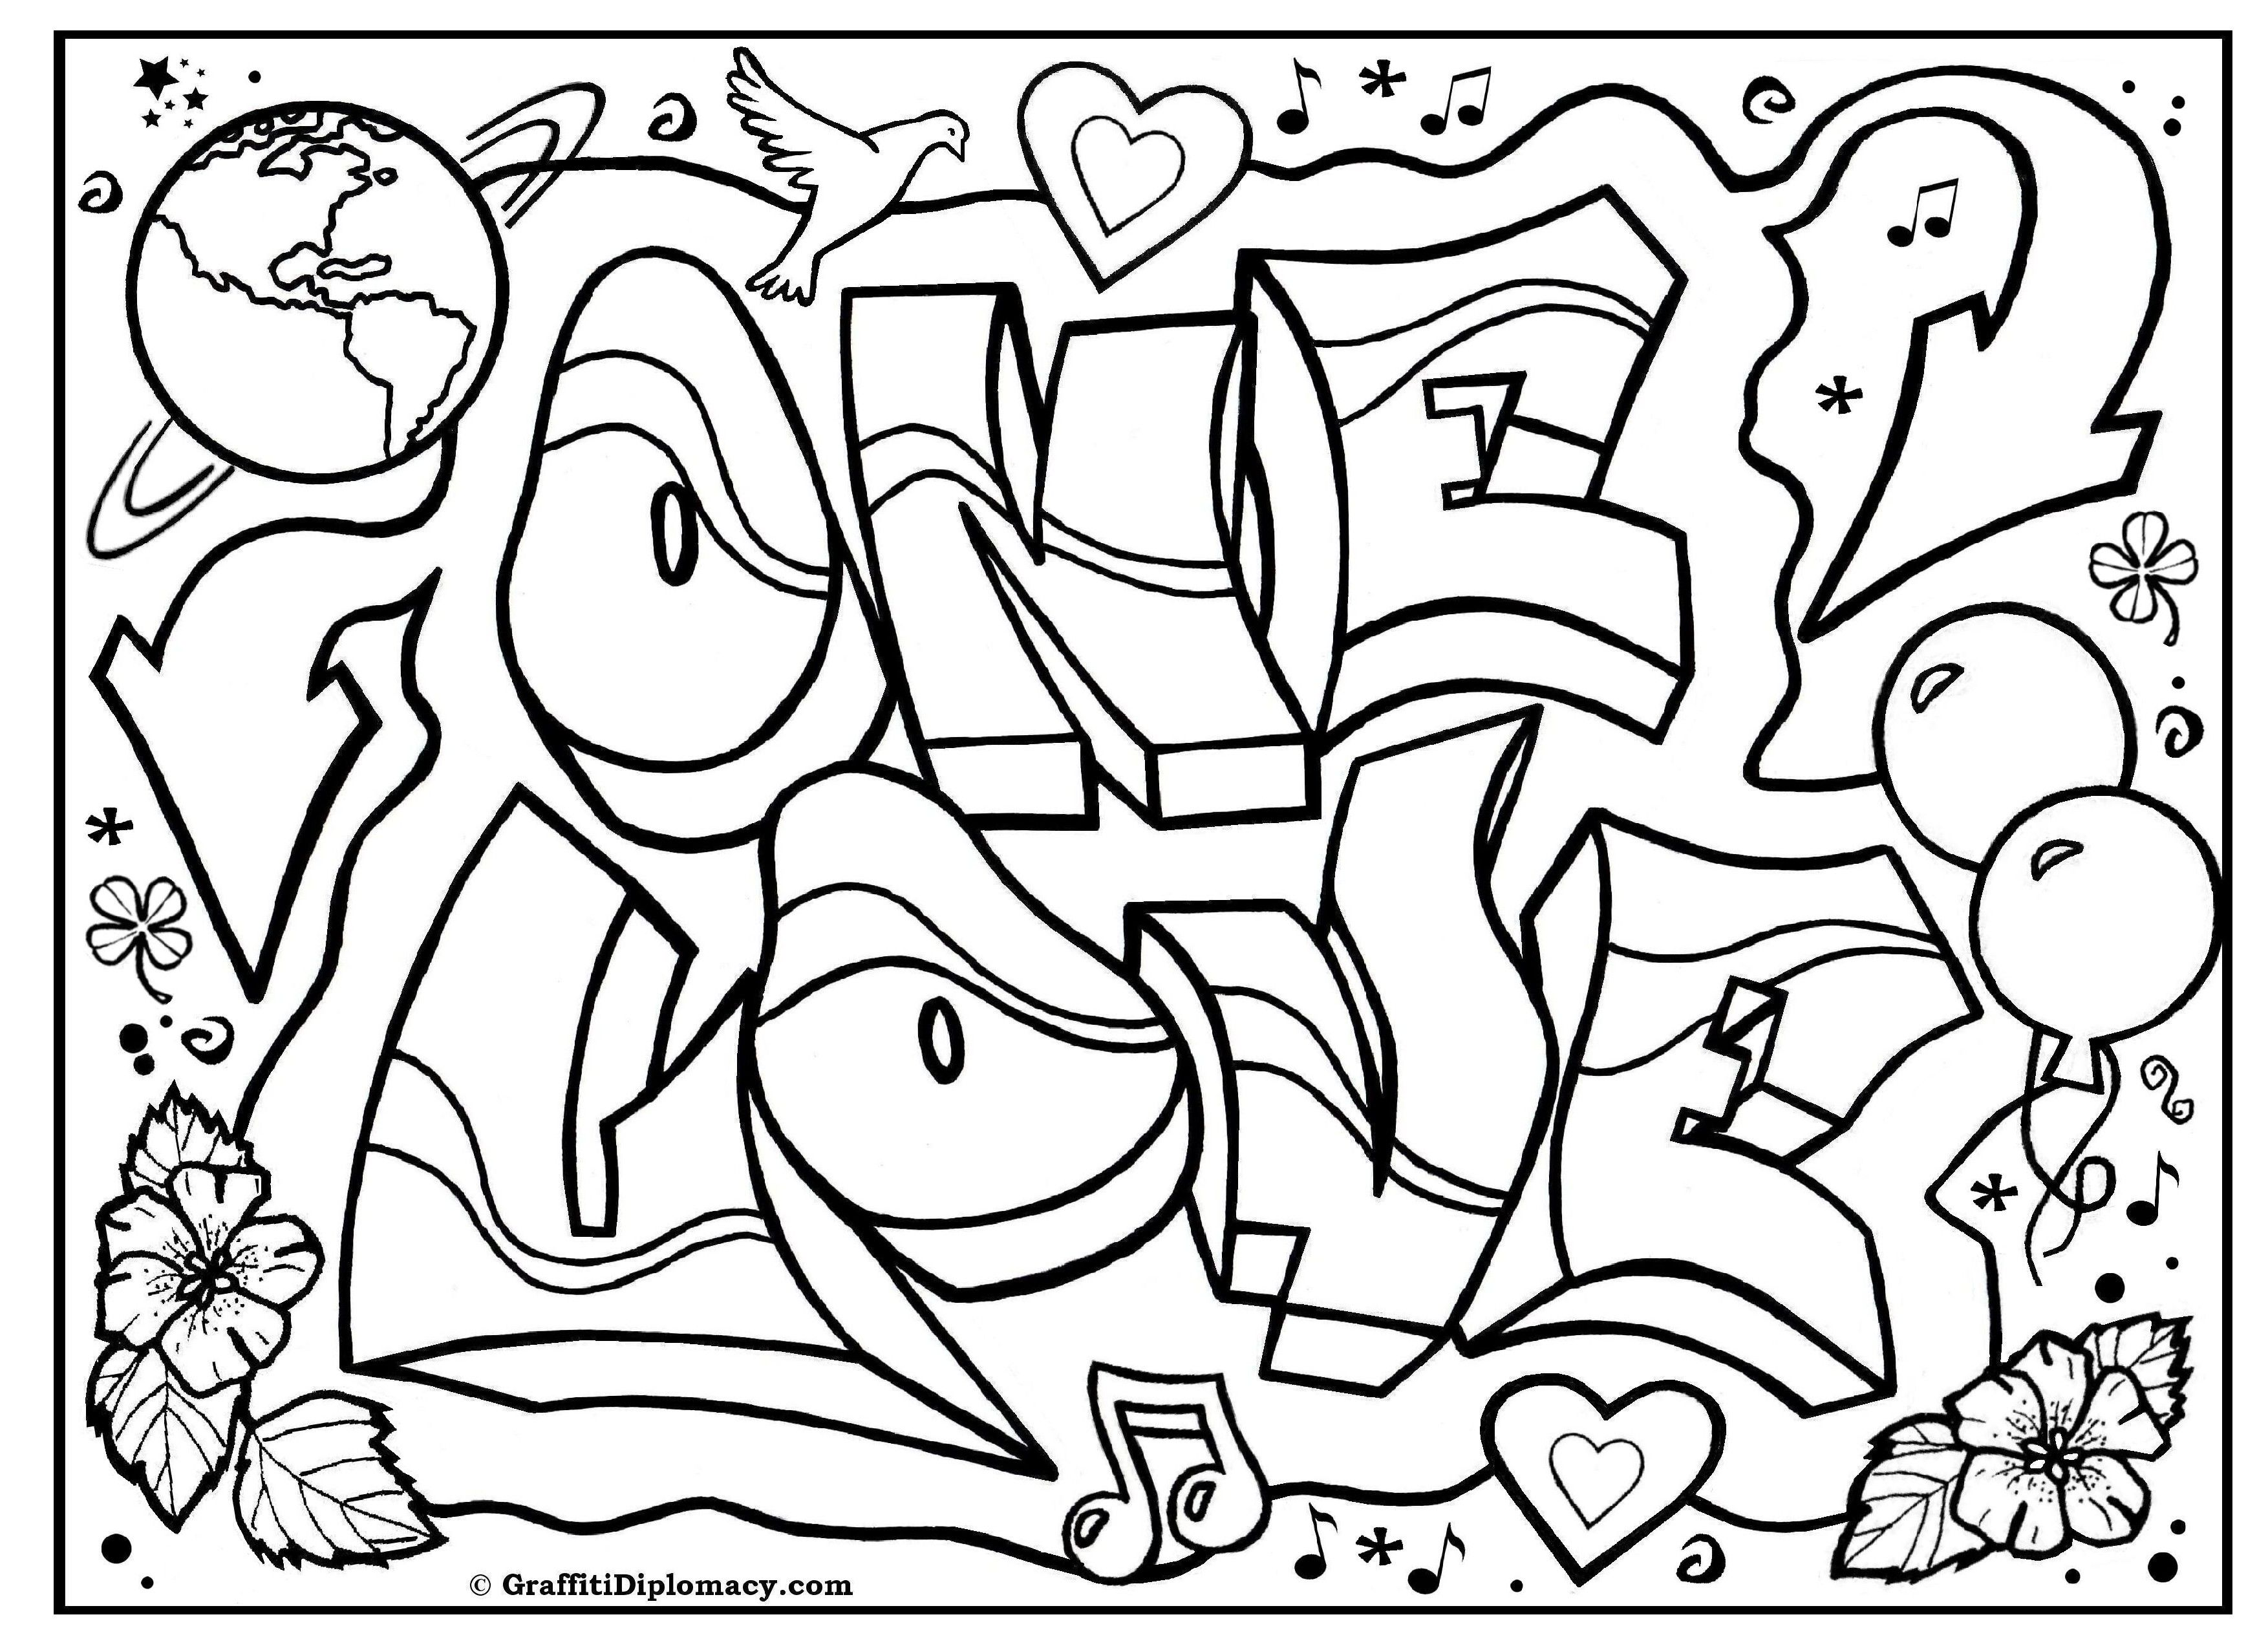 Graffitidiplomacy Com Files One Love Jpg Love Coloring Pages Free Coloring Pages Coloring Pages Inspirational